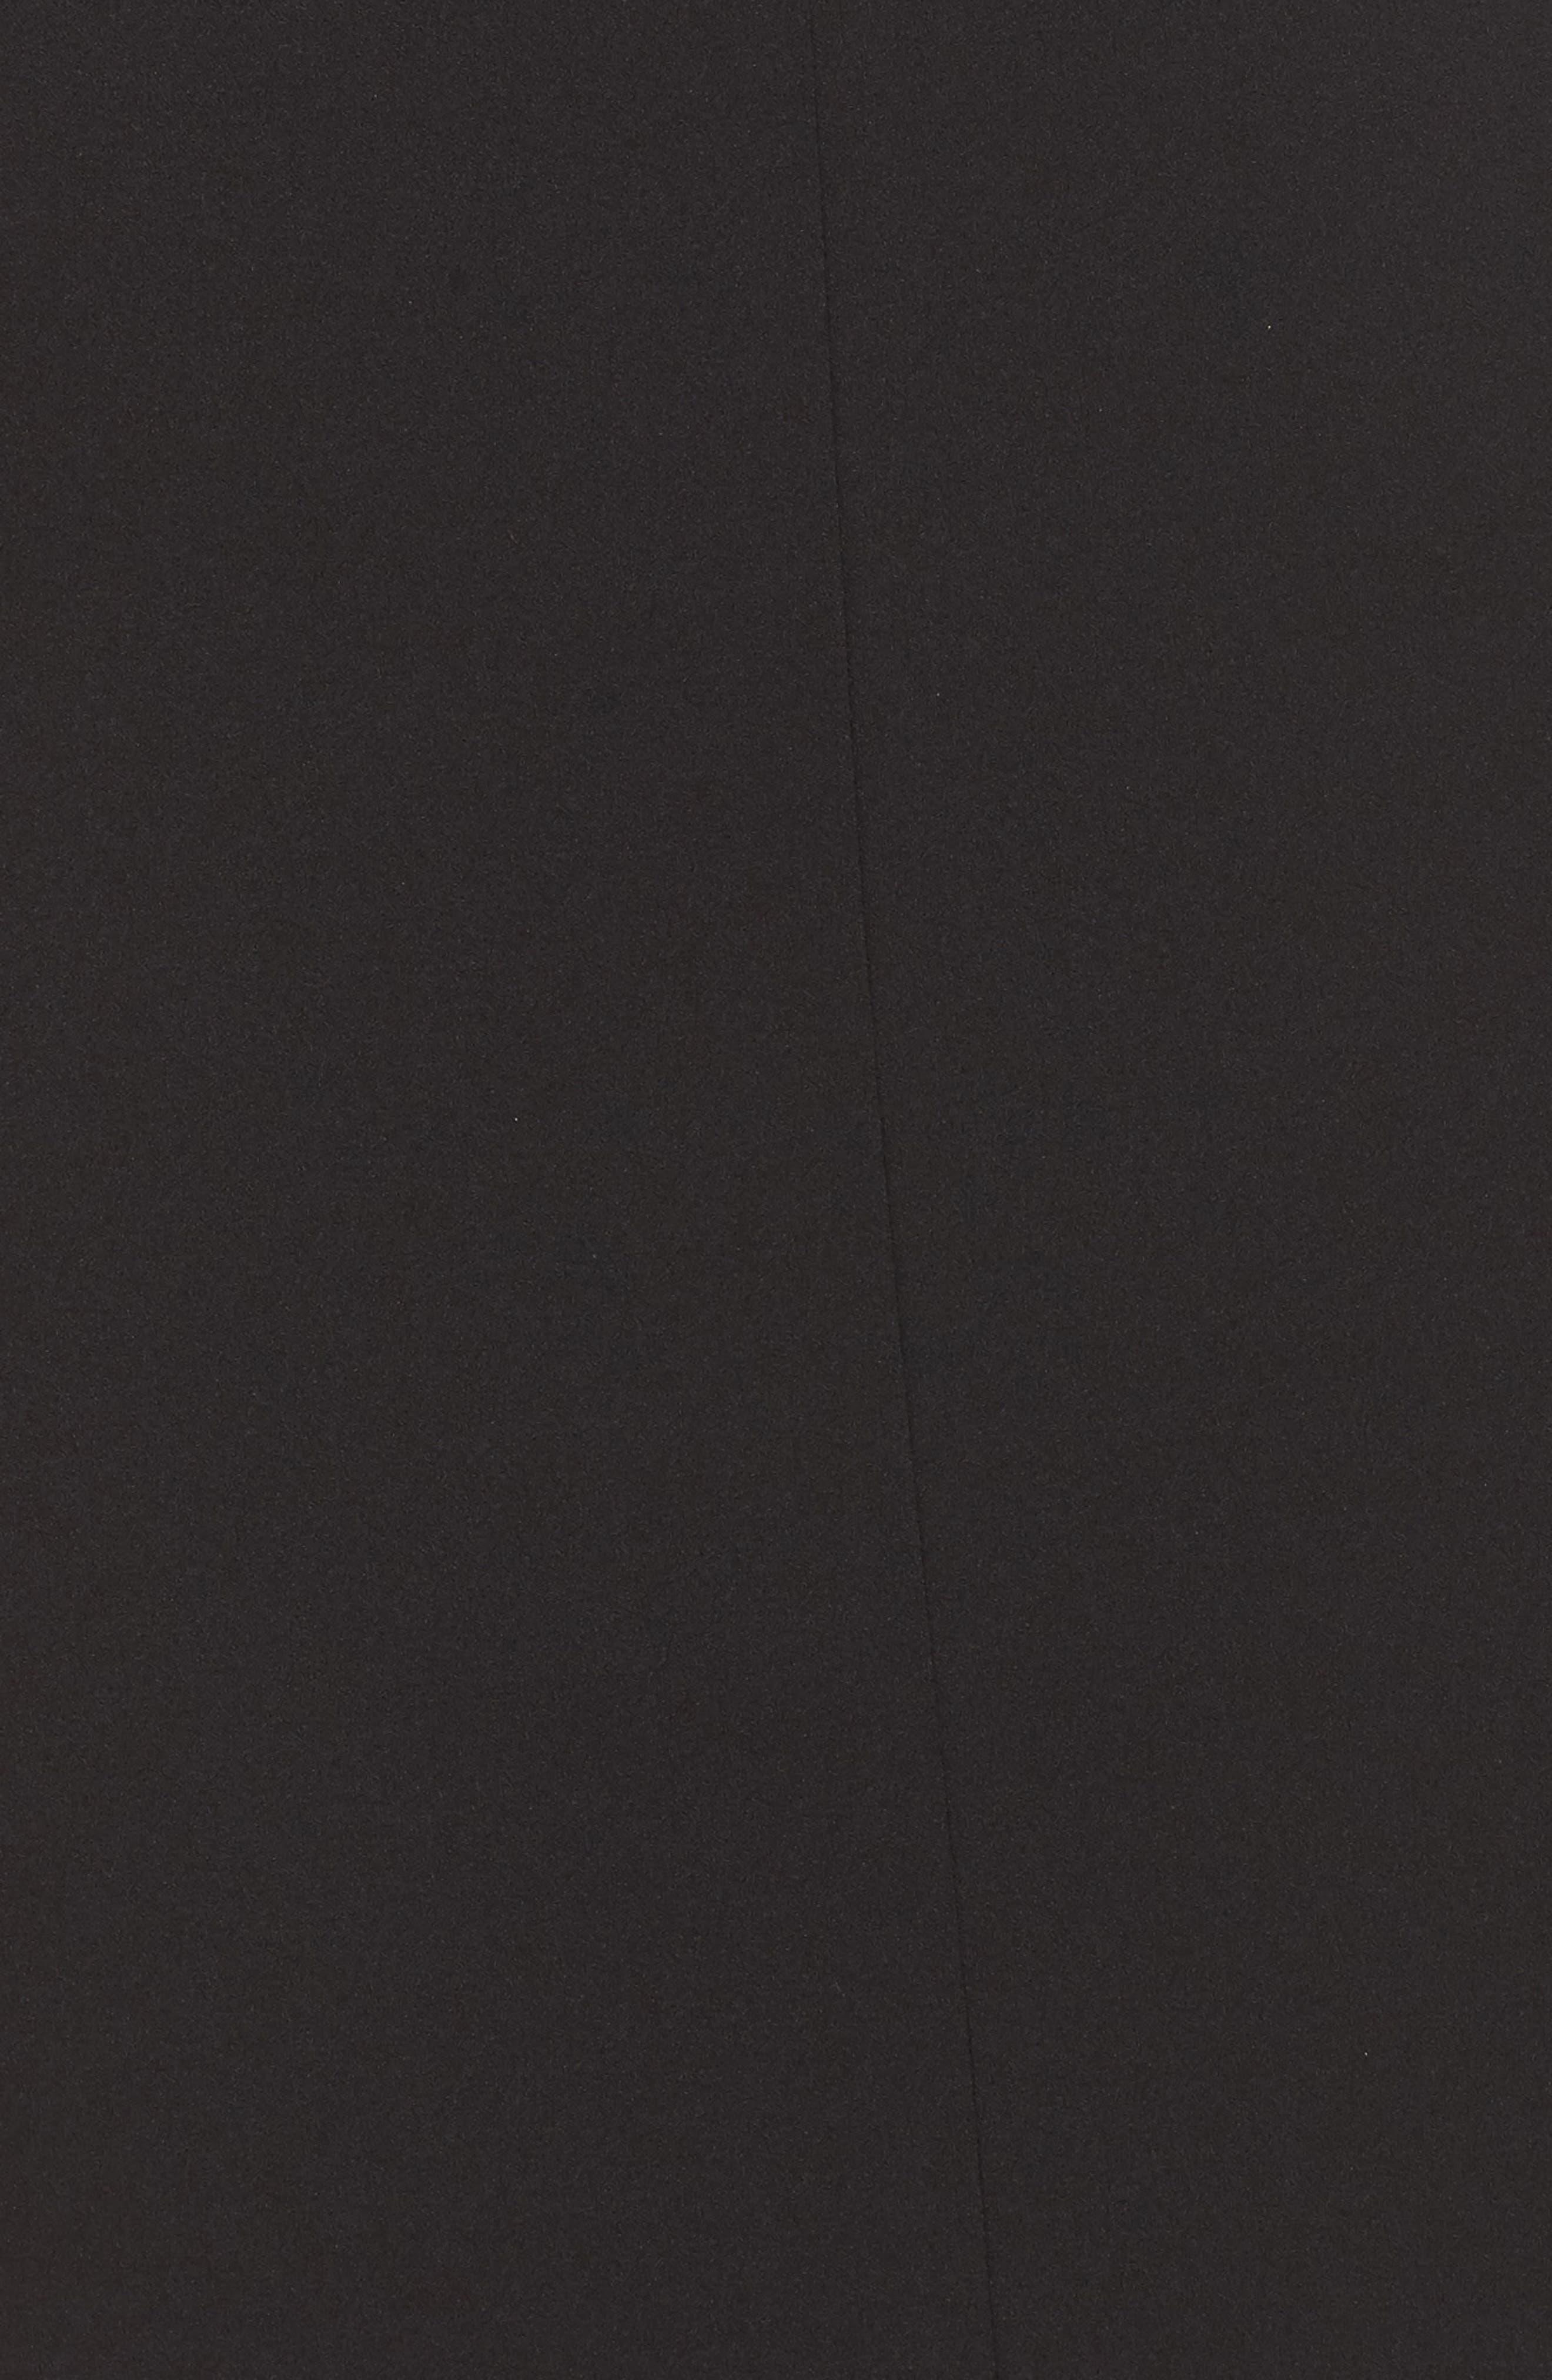 Stretch Crepe Sheath Dress,                             Alternate thumbnail 5, color,                             019